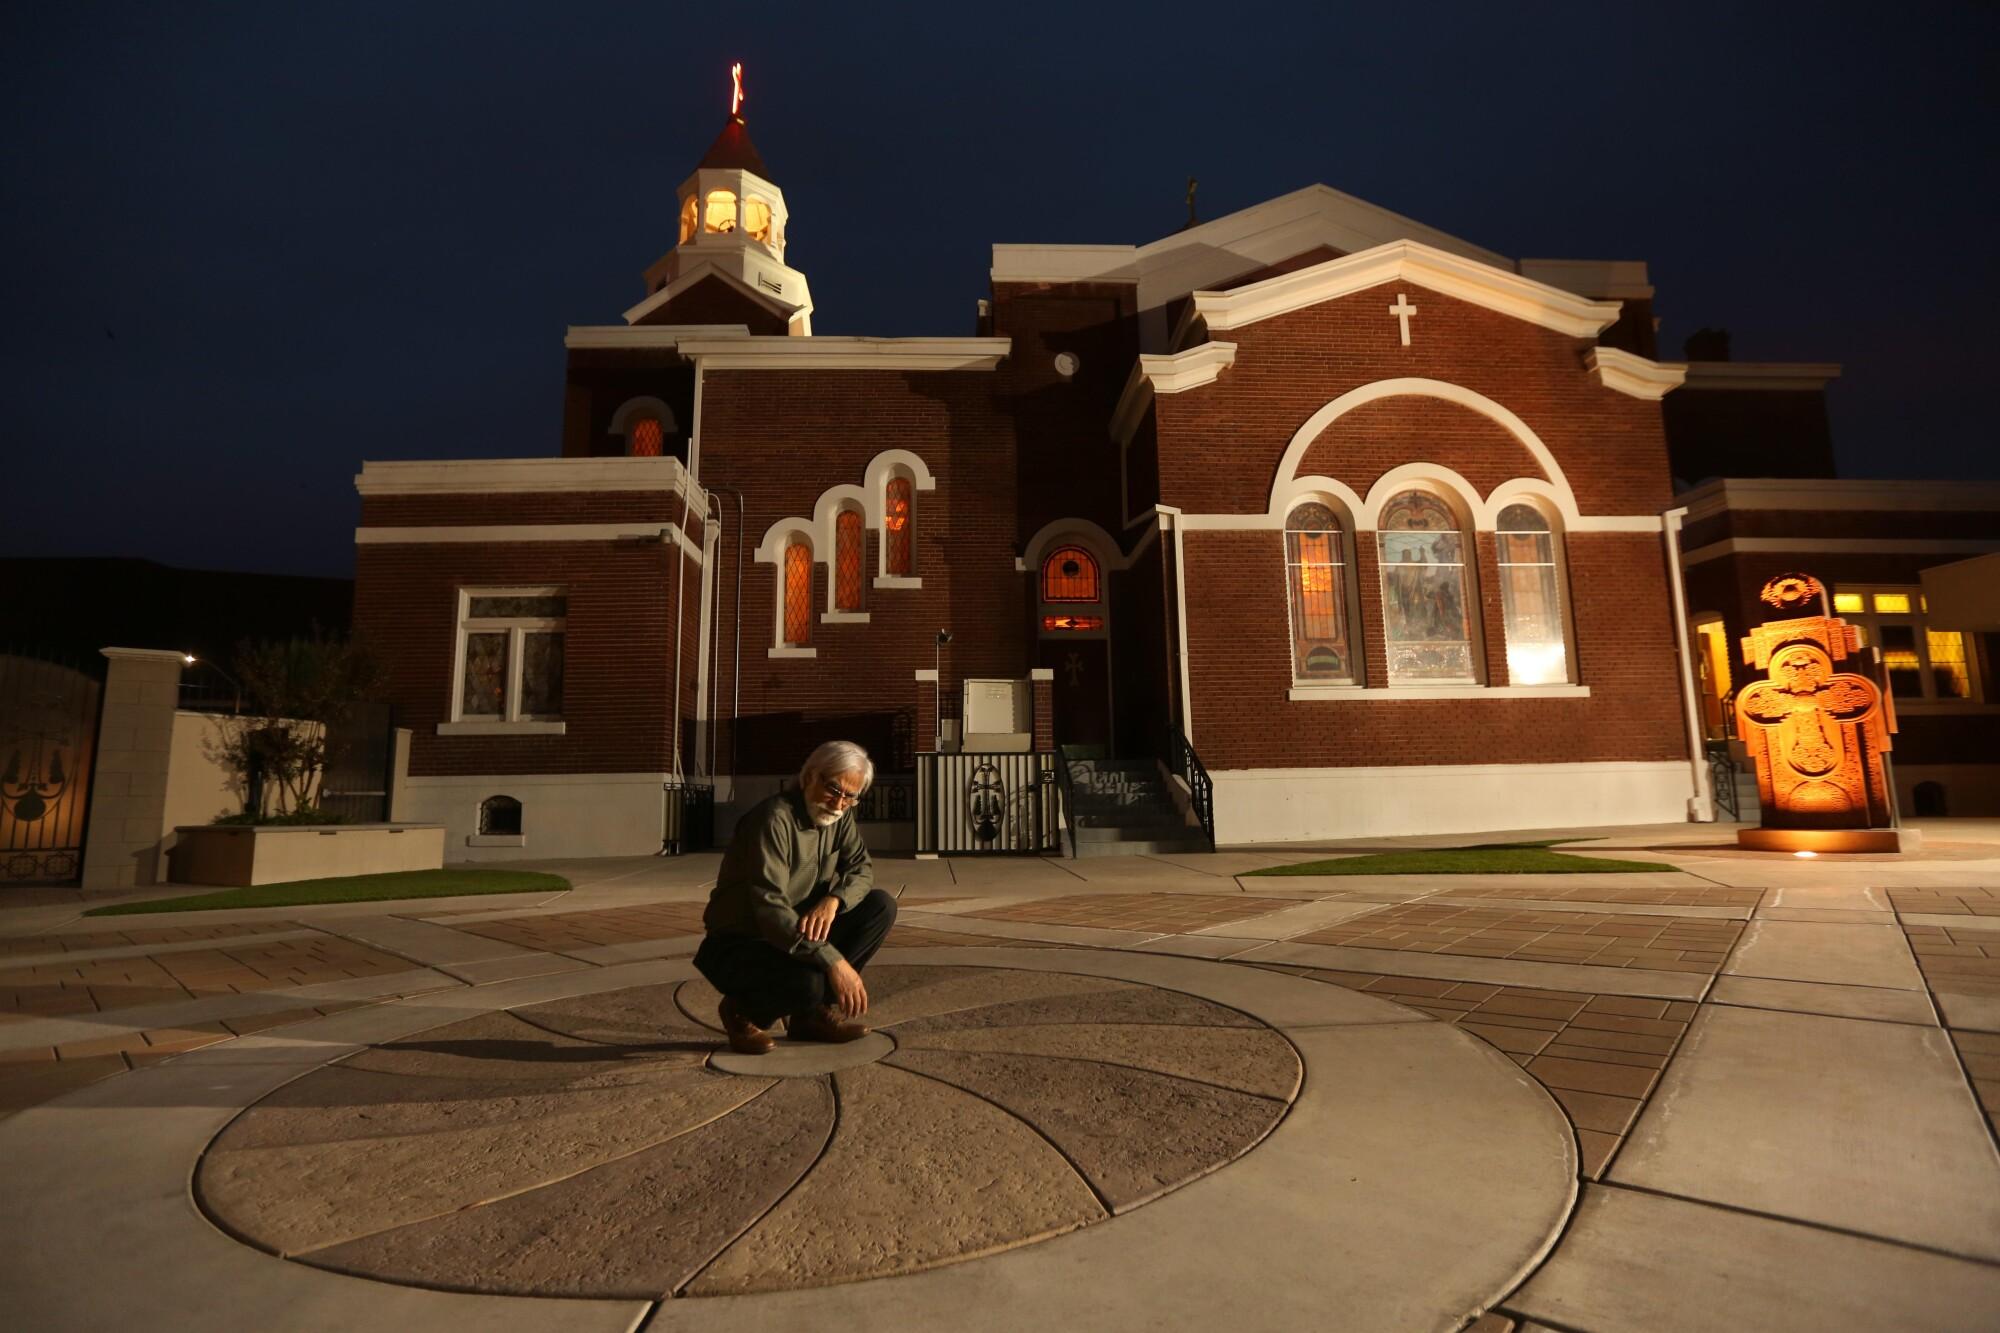 Varoujan Der Simonian kneels in the center of a concrete design outside a church